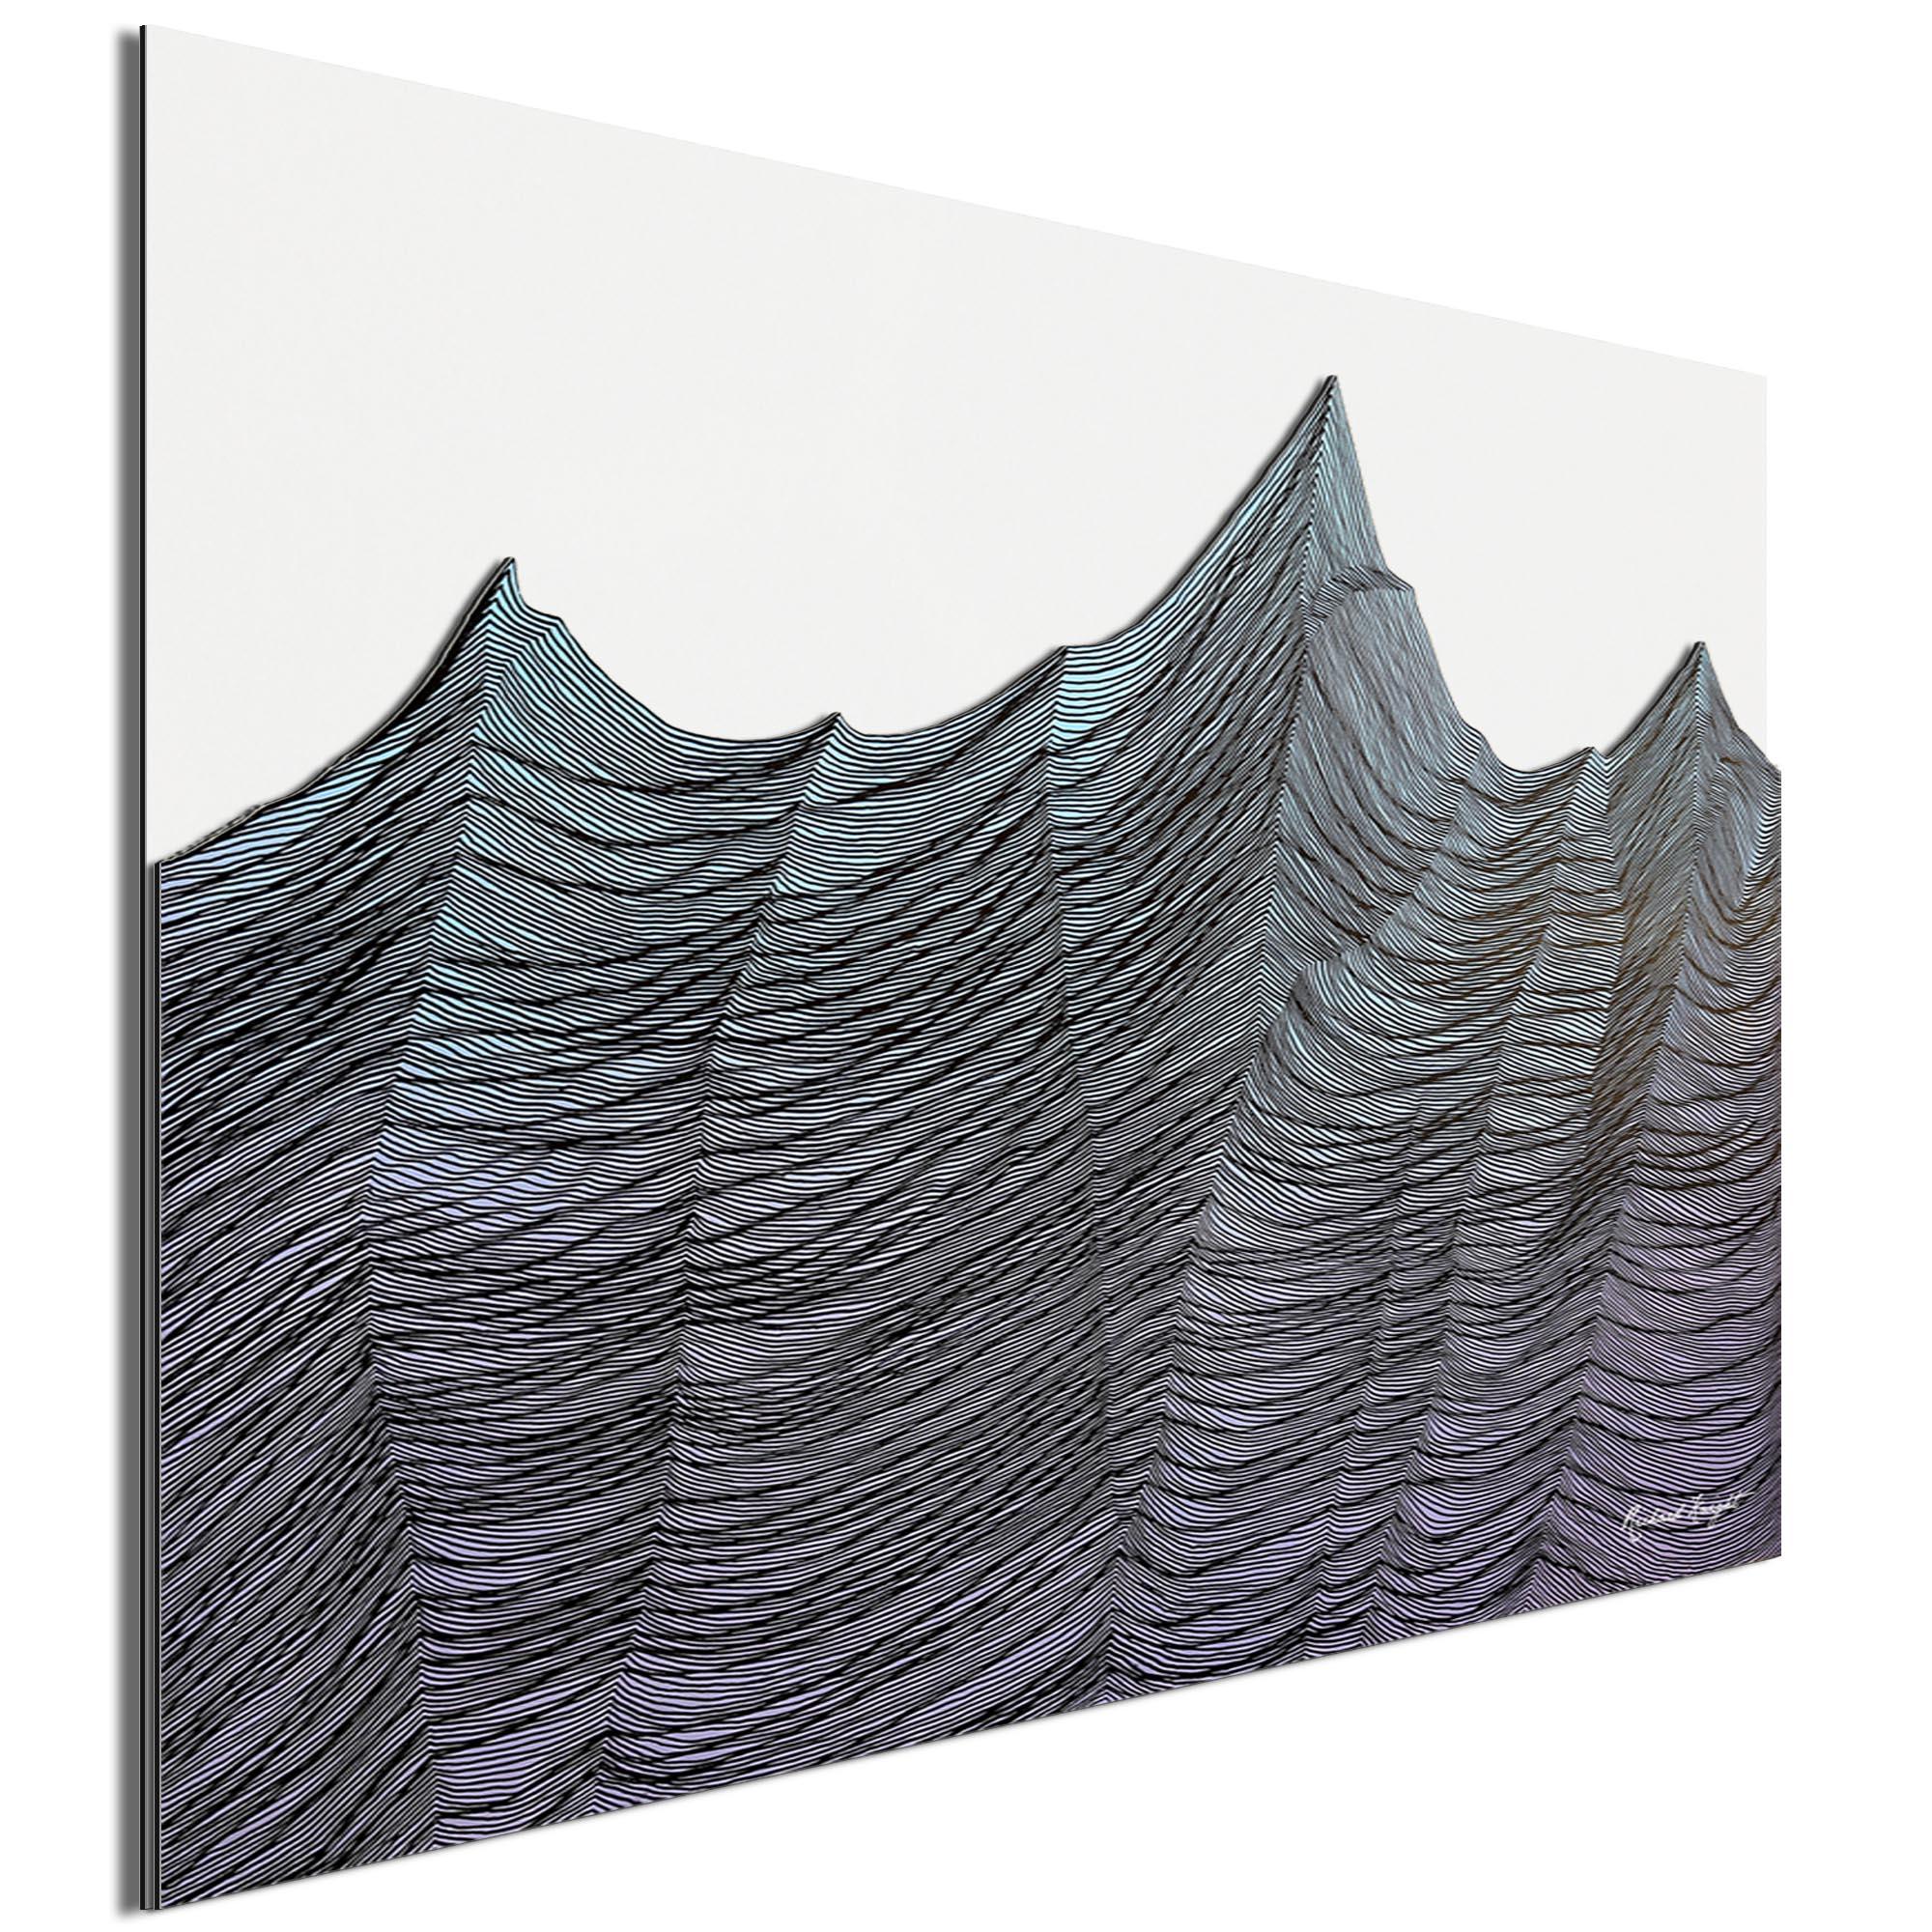 Brisk Range by Richard Knight - Ltd. Ed. Minimalist Abstract Landscape Art - Image 2